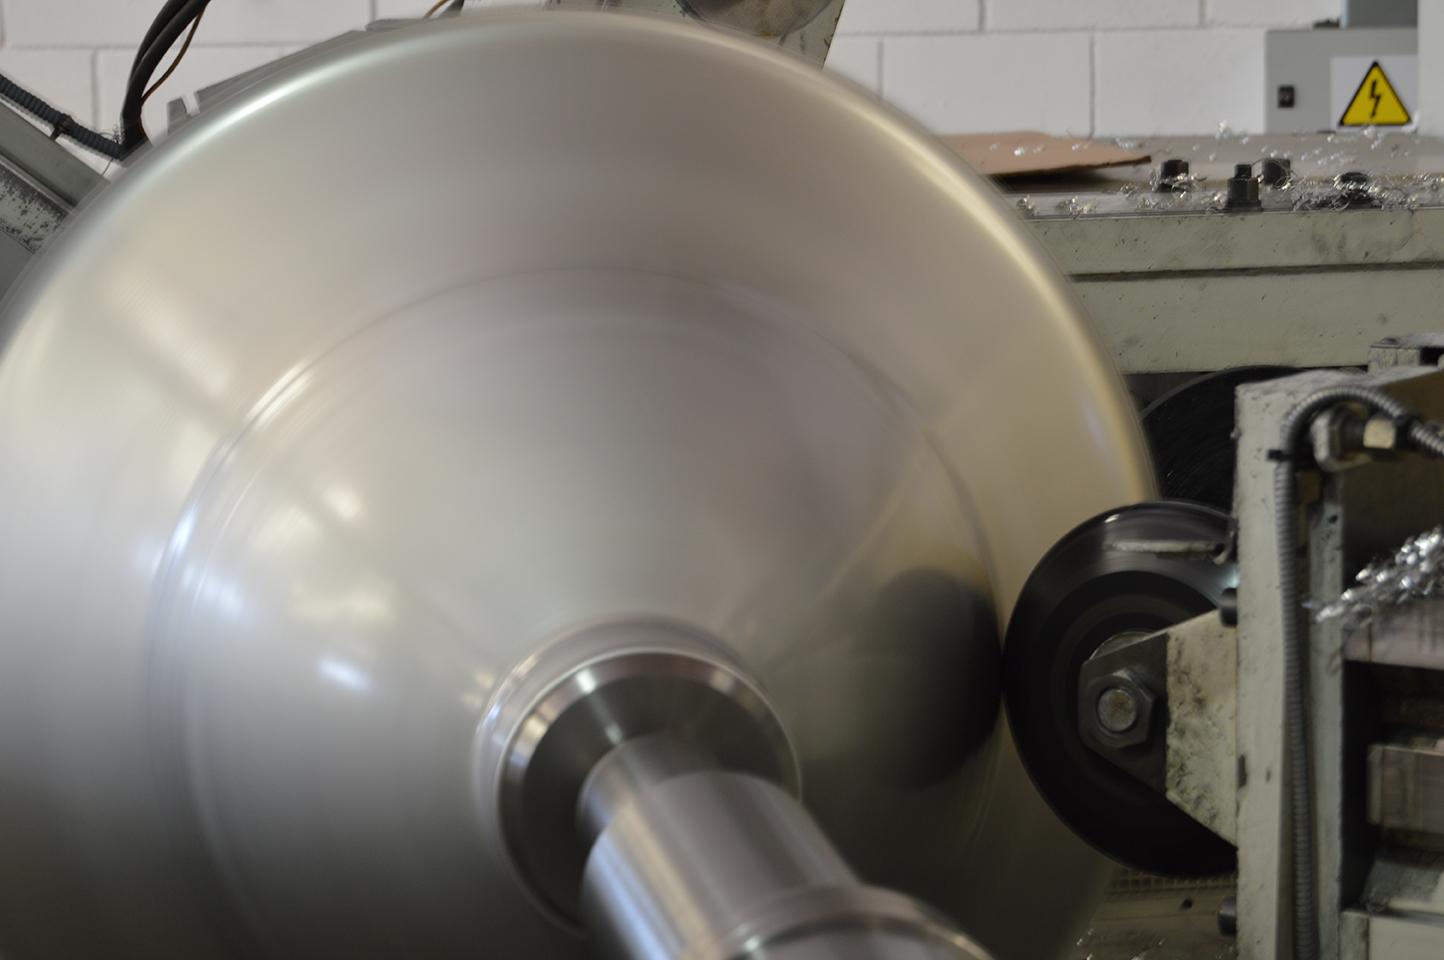 Repulsados, repulsado, entallado metálico, metal spinning, repousagge